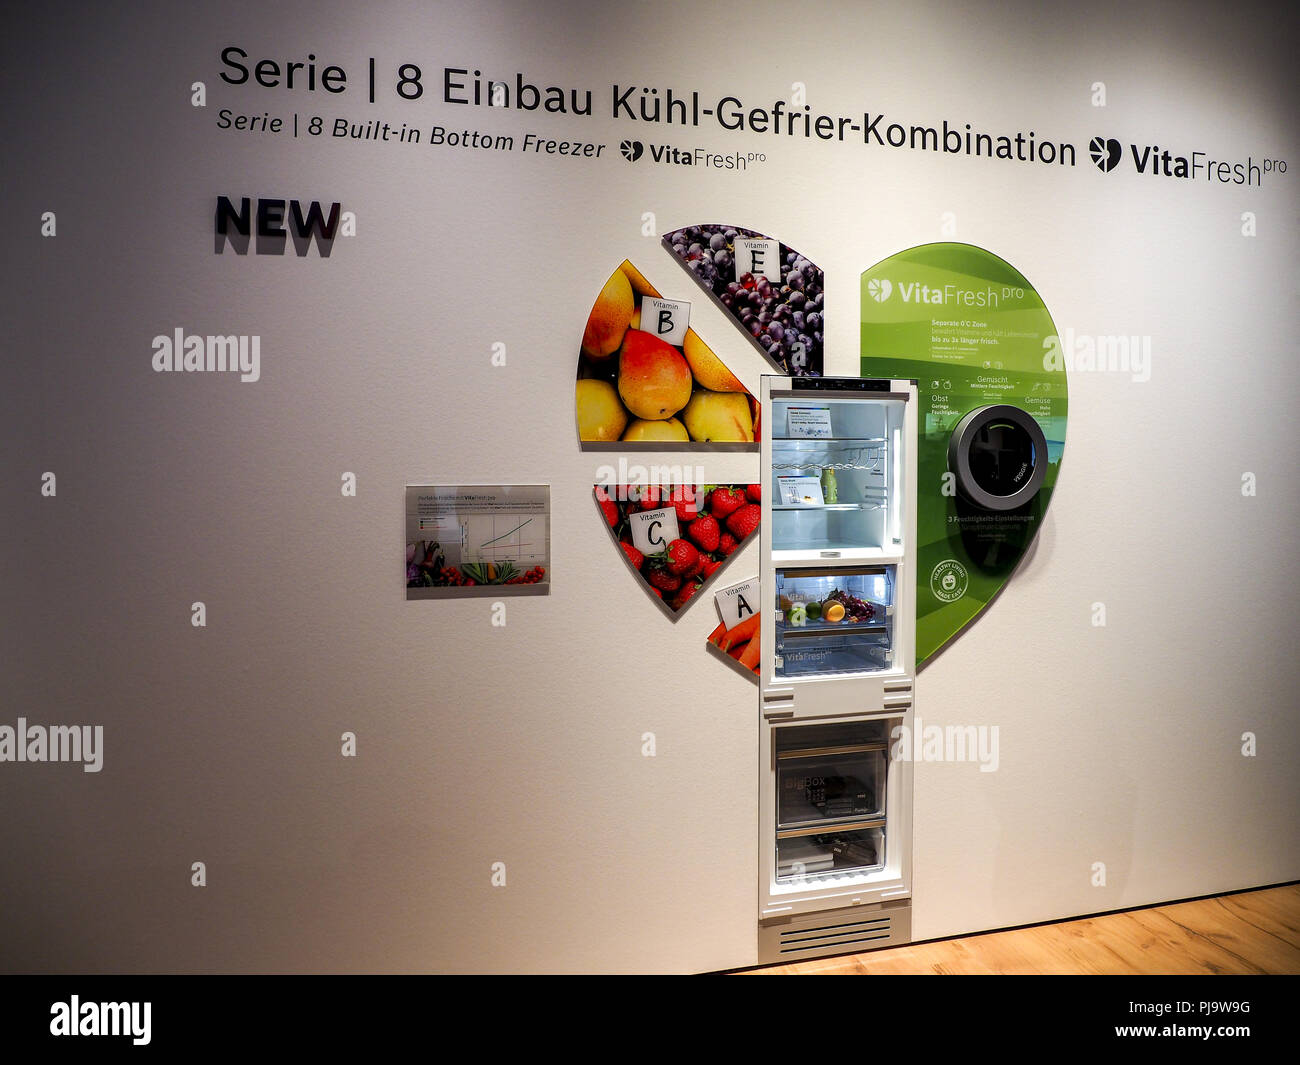 Bosch Kühlschrank Serie 8 : Bosch vitafresh kühlschrank ifa berlin internationale